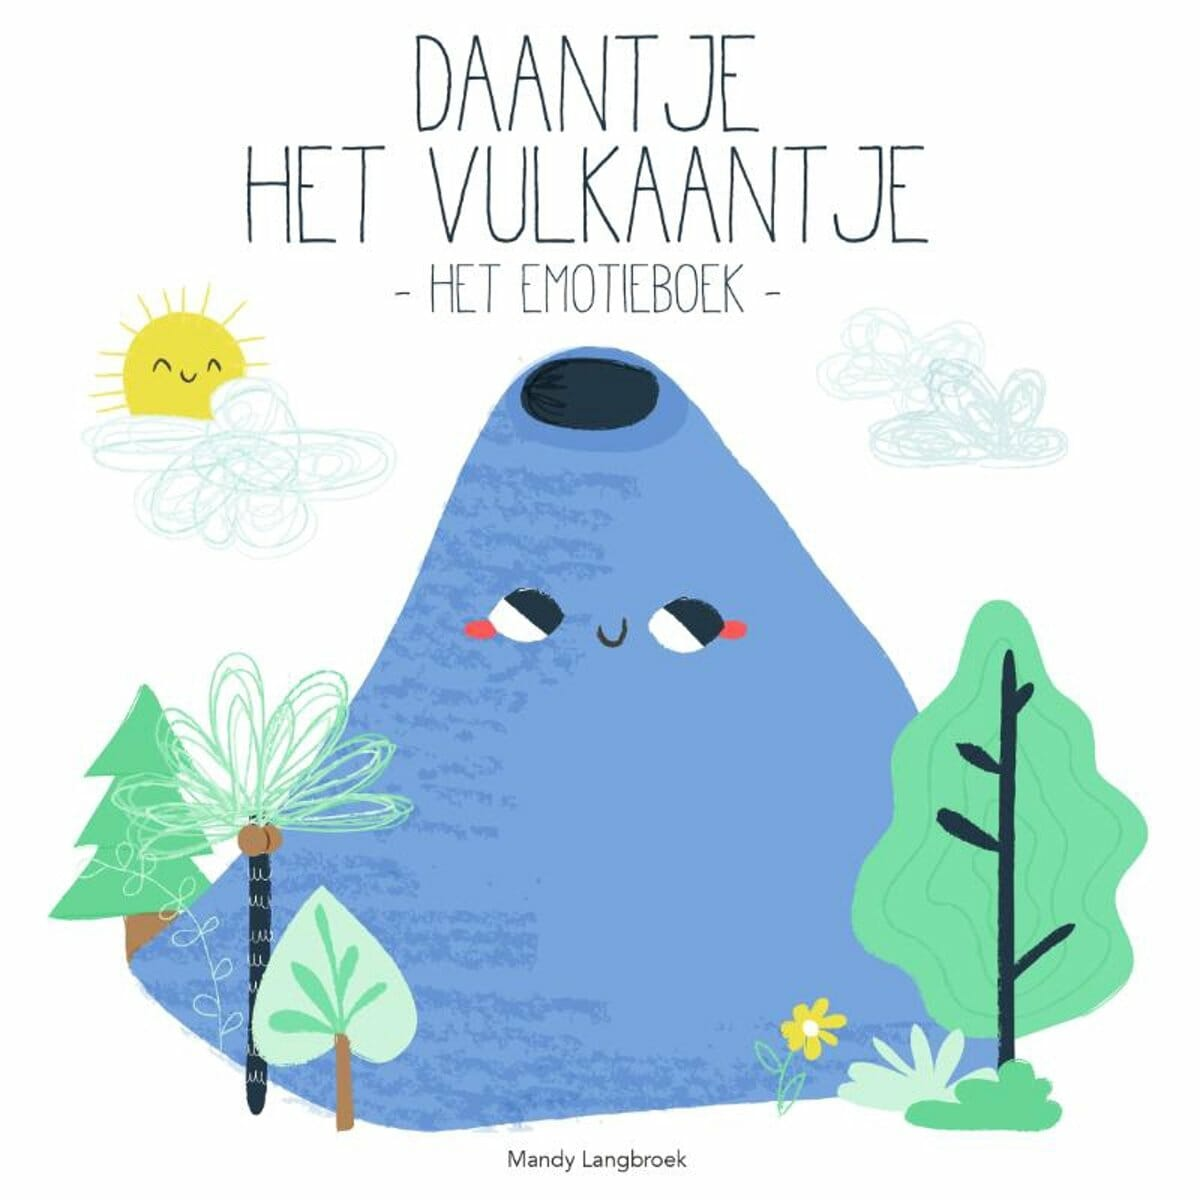 daantje-het-vulkaantje-reviewpanel